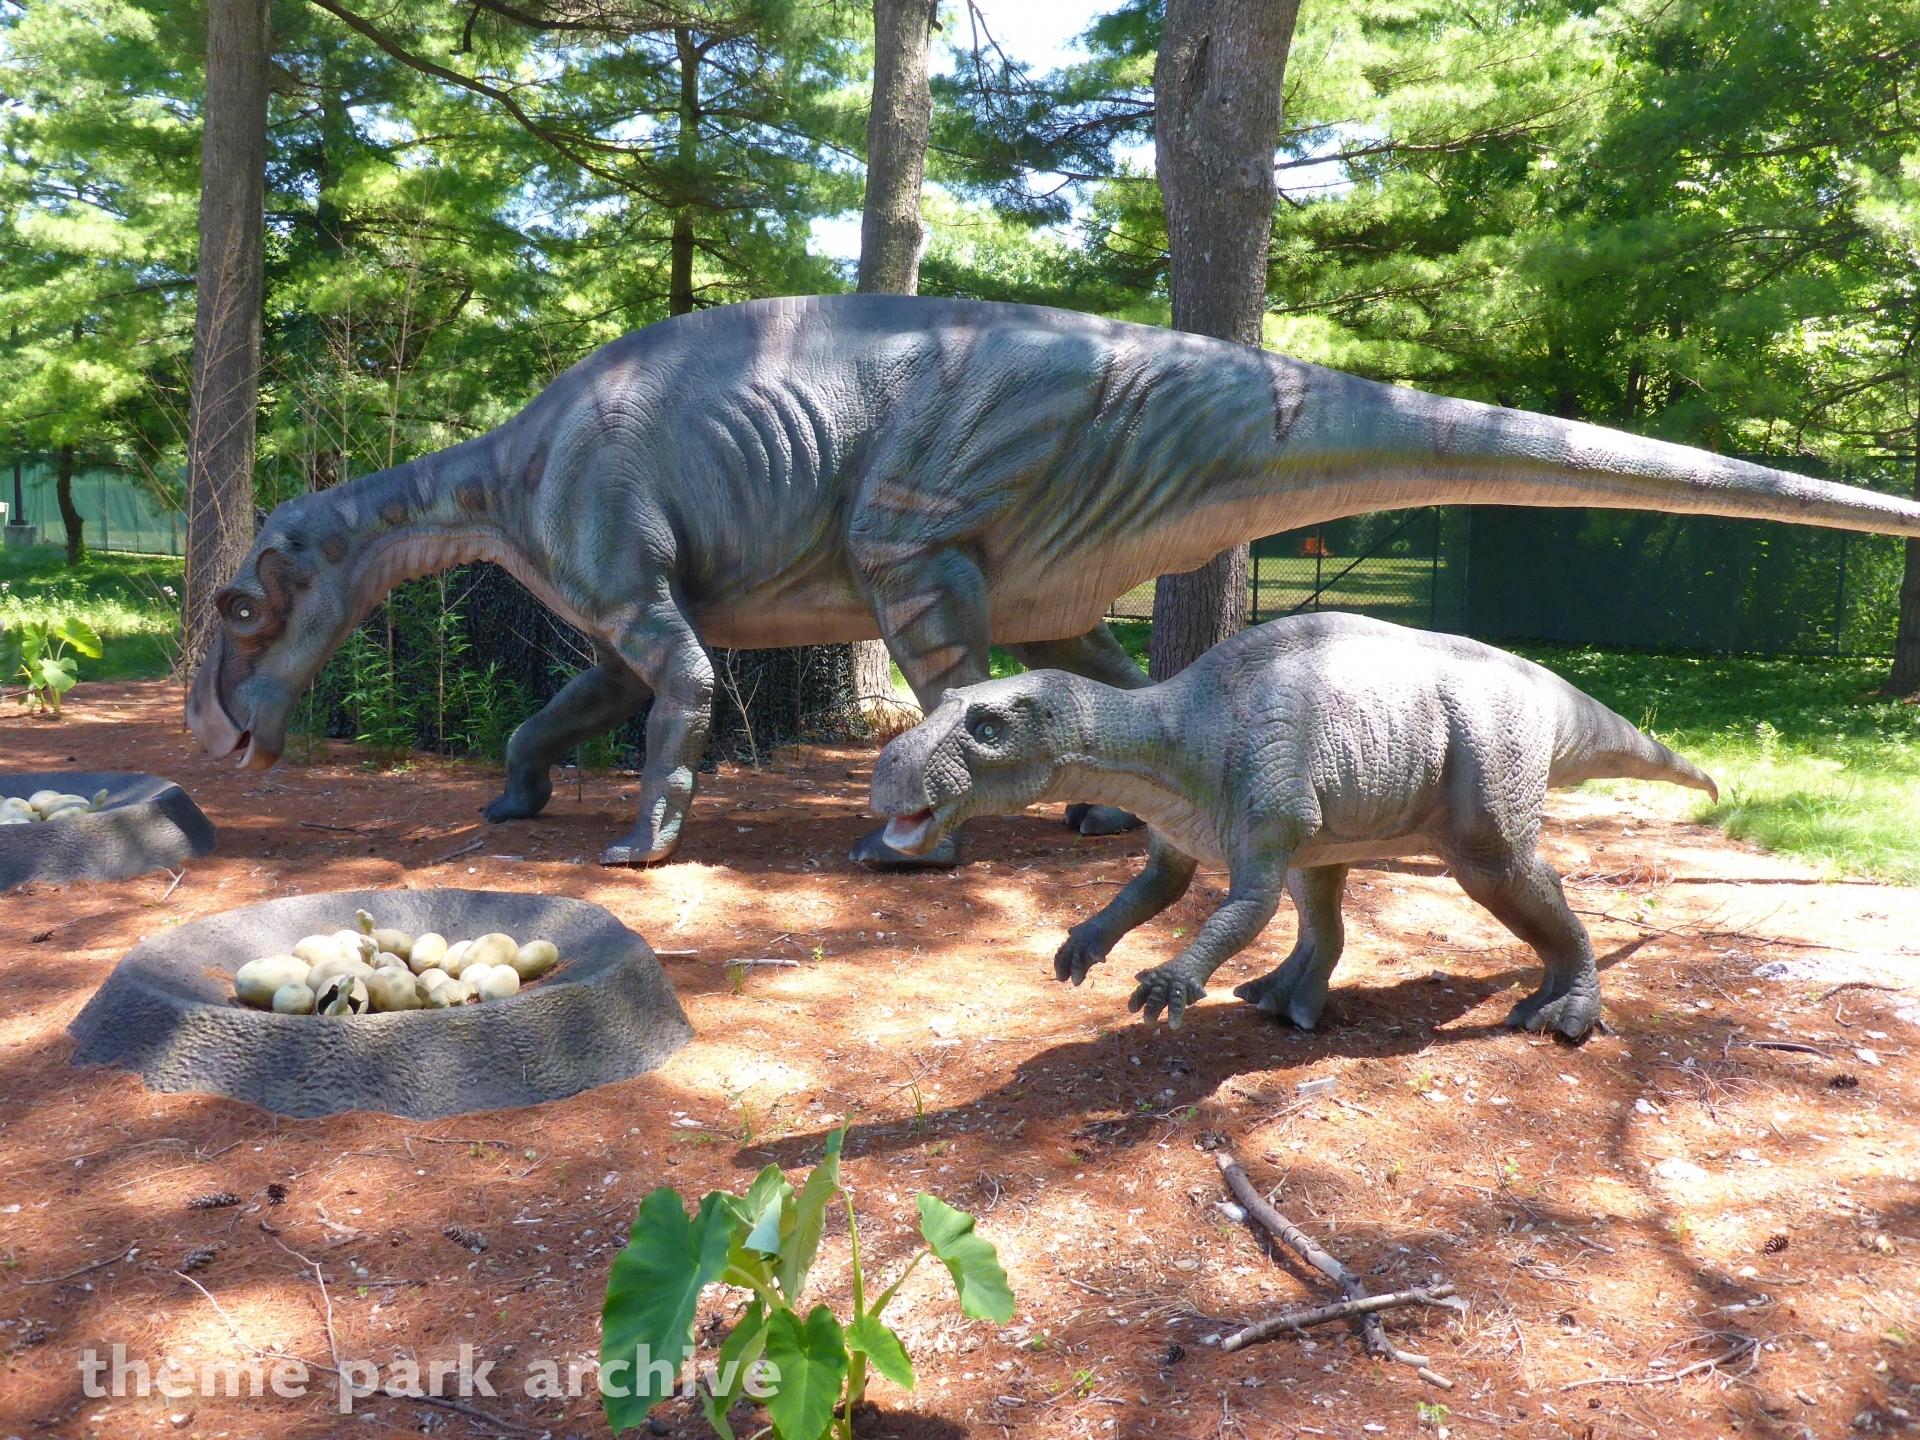 Dinosaurs Alive at Dorney Park